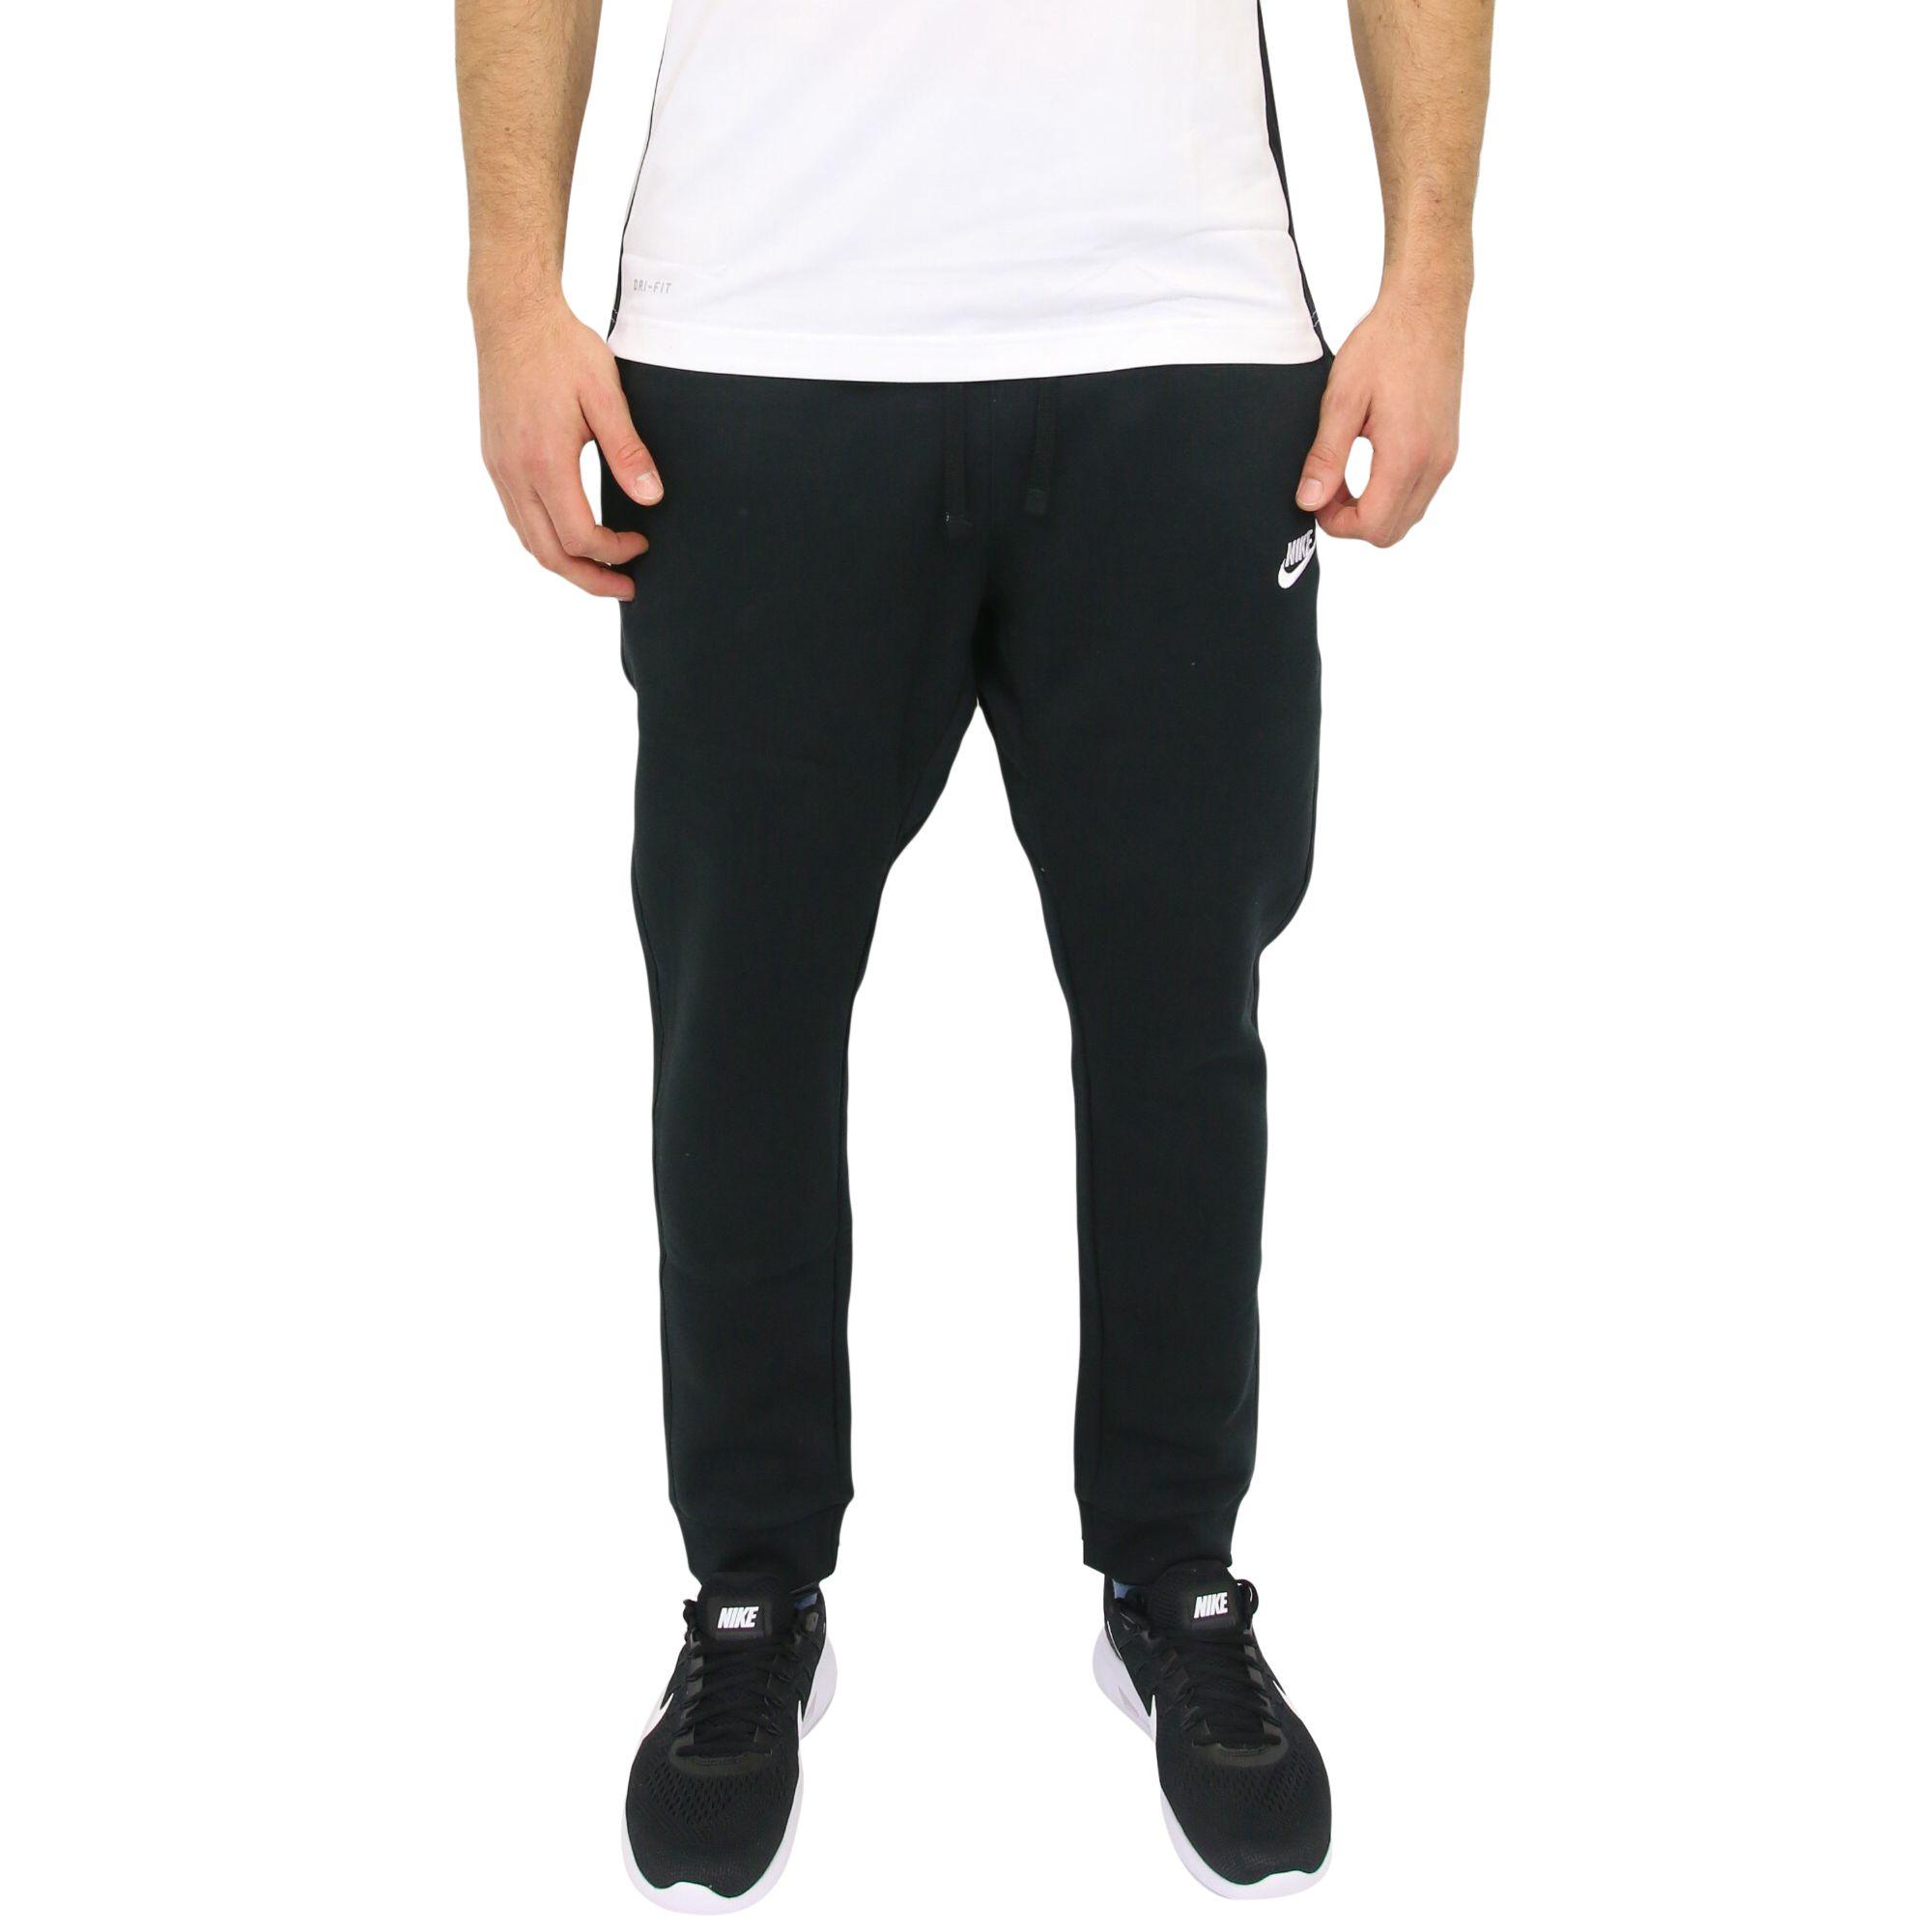 9c270ff2c66f4a Nike Jogginghose Sportswear Hose Trainingshose Jogger Herren 804408 ...